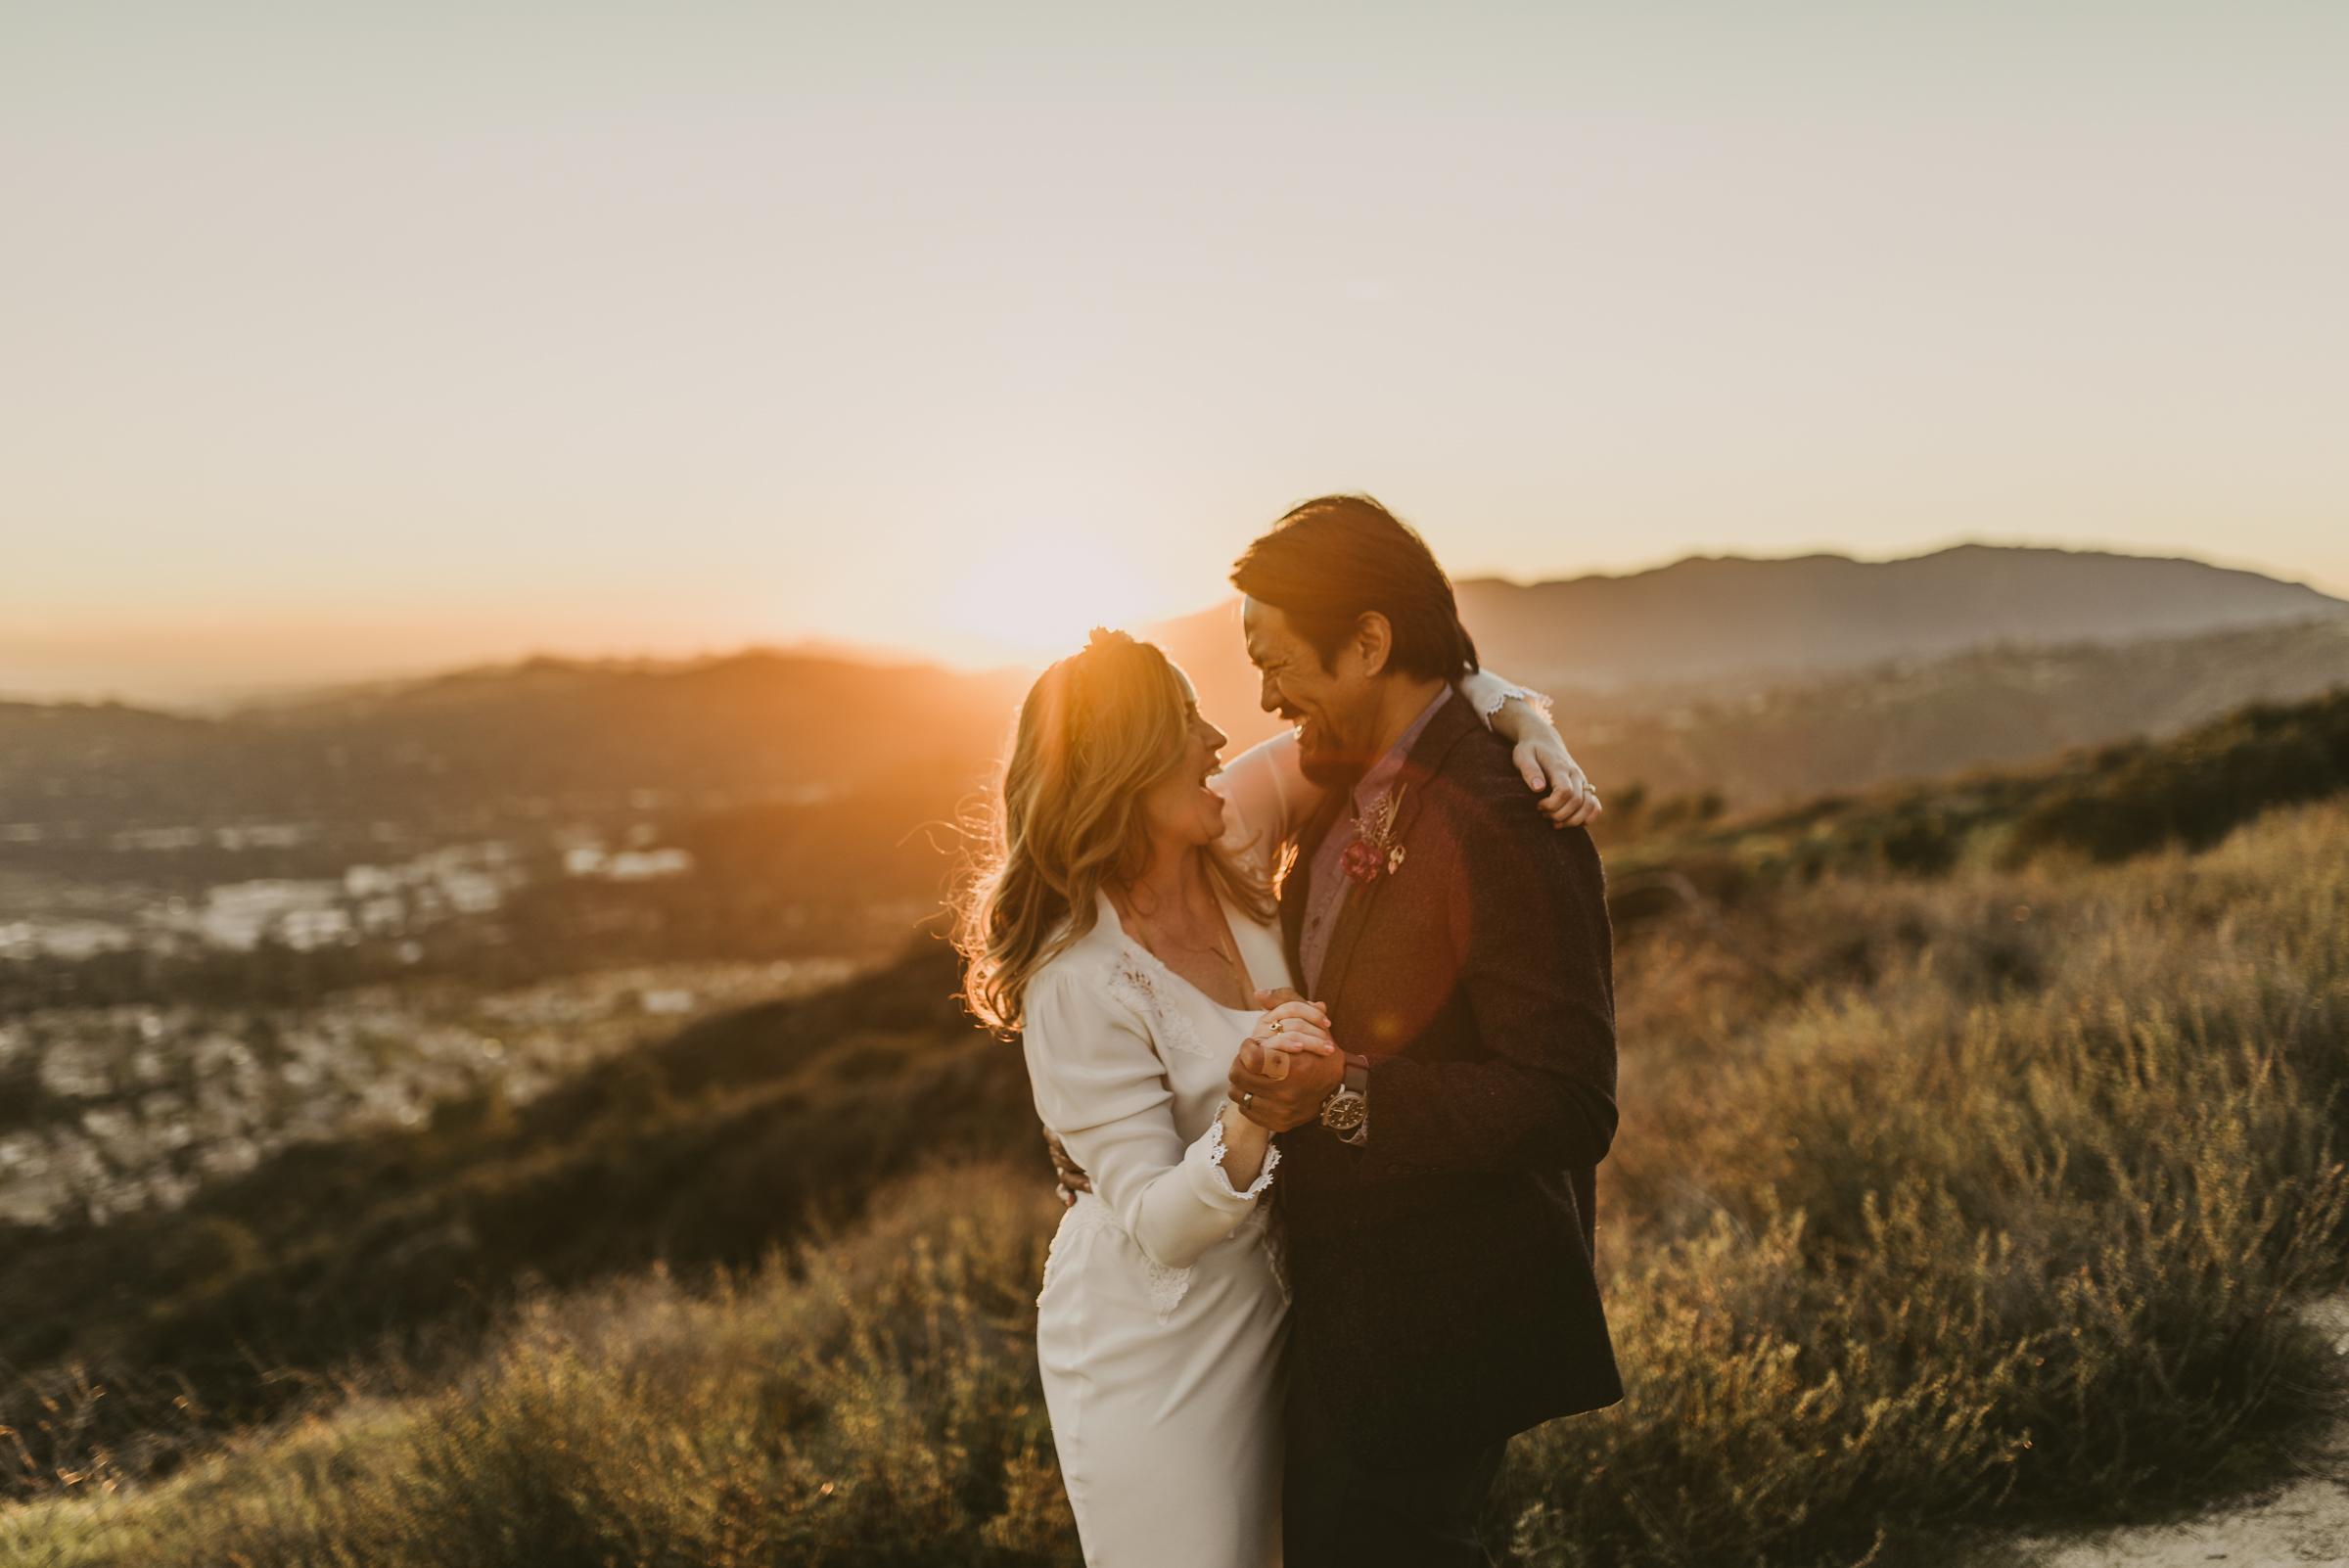 ©Isaiah + Taylor Photography - Intimate Elopement, Eaton Canyon, Los Angeles Wedding Photographer-97.jpg